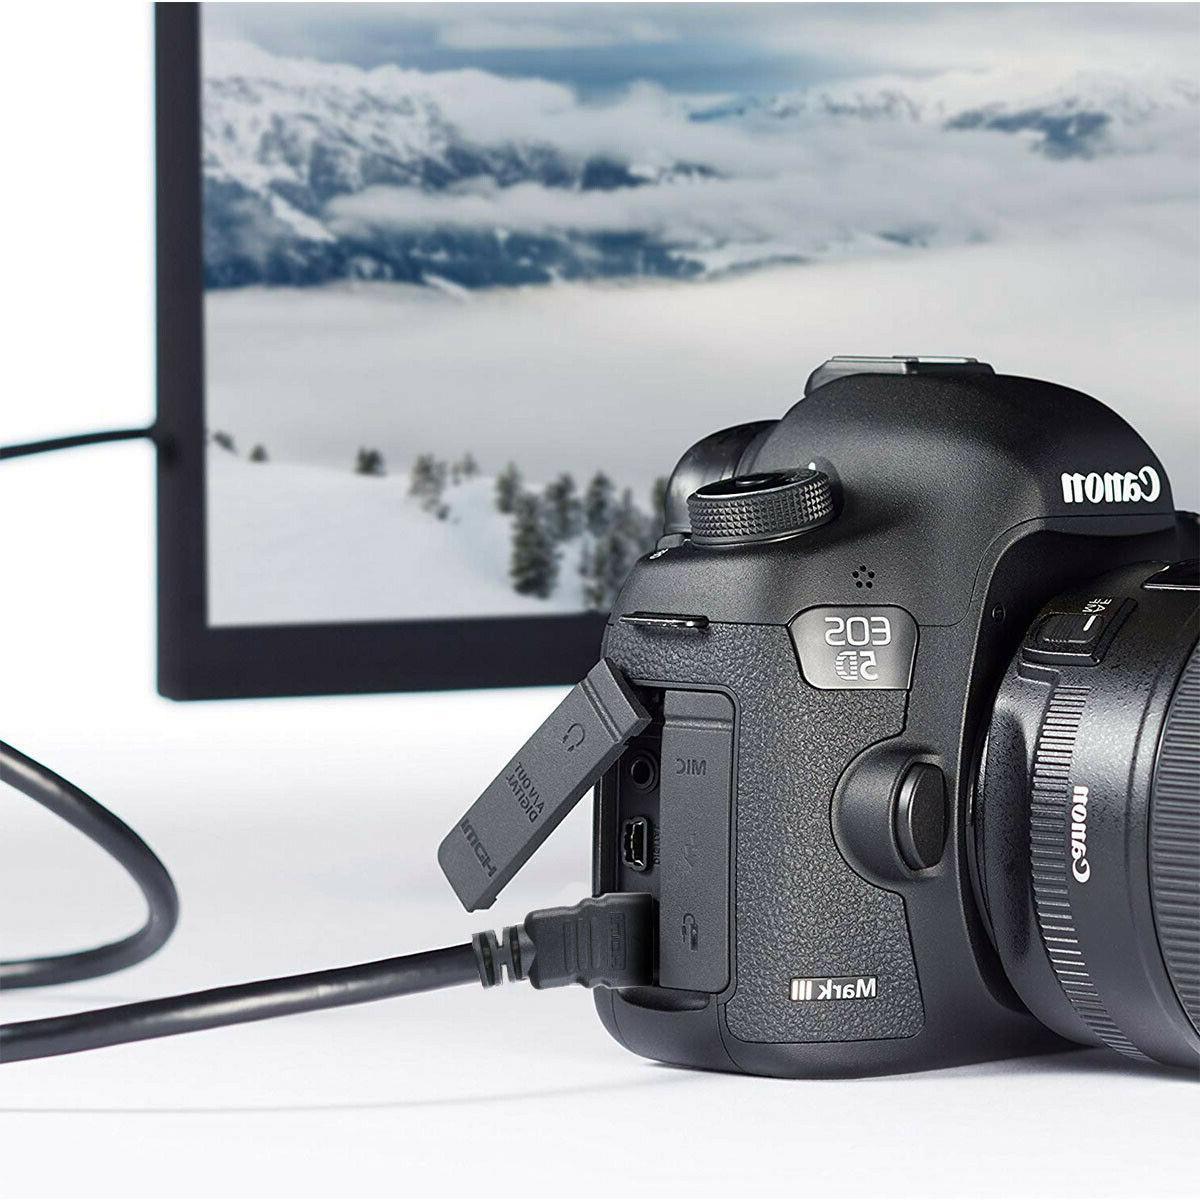 2pcs Mini HDMI for HDTVs Cameras Cable